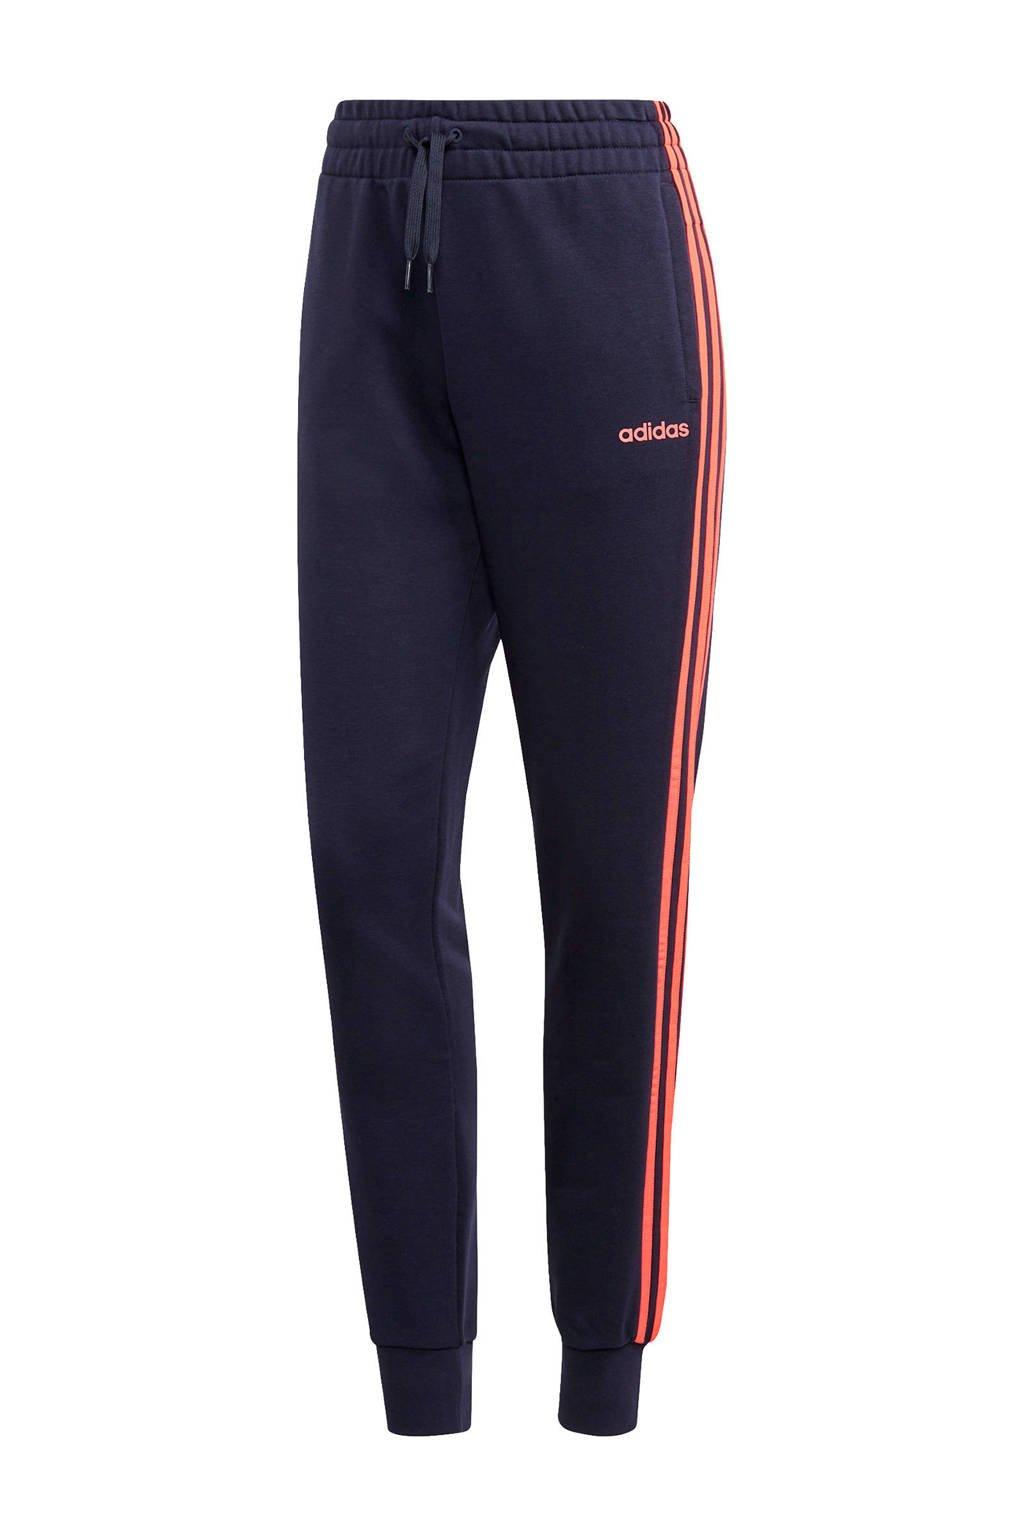 adidas Performance sportbroek donkerblauw/koraalrood, Donkerblauw/koraalrood